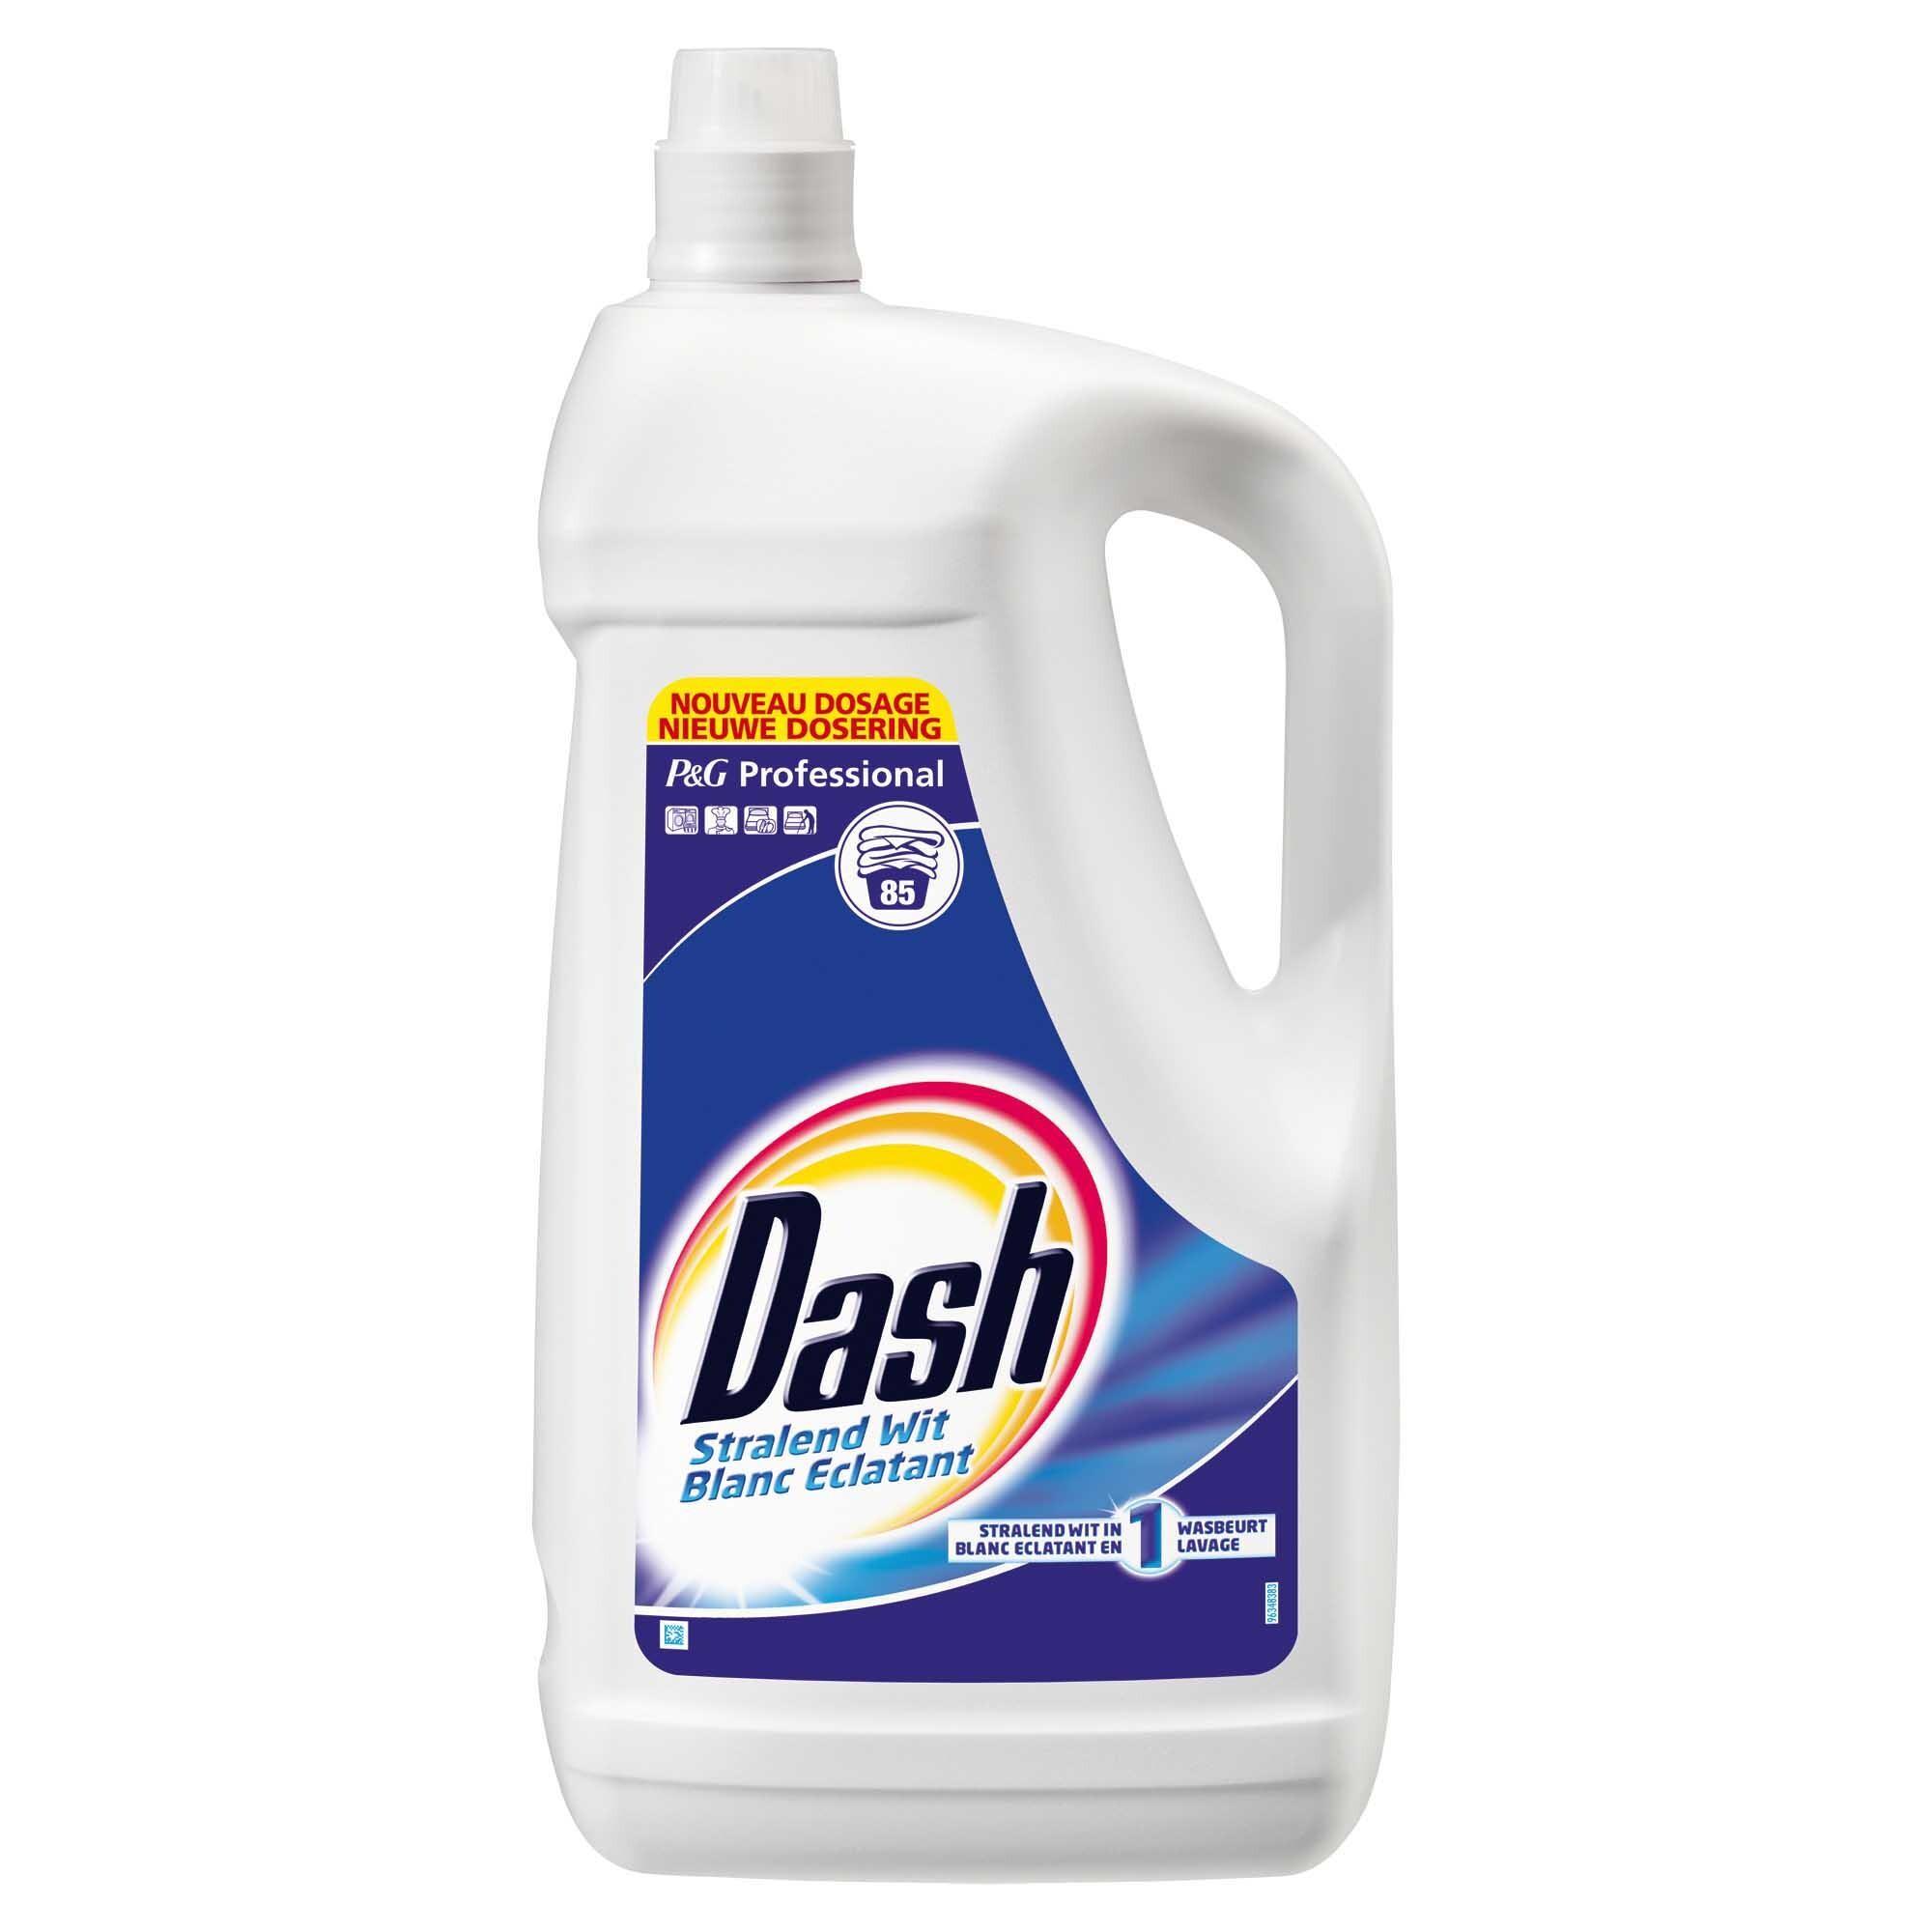 Dash 5.25L vloeibaar wasmiddel P&G Professional